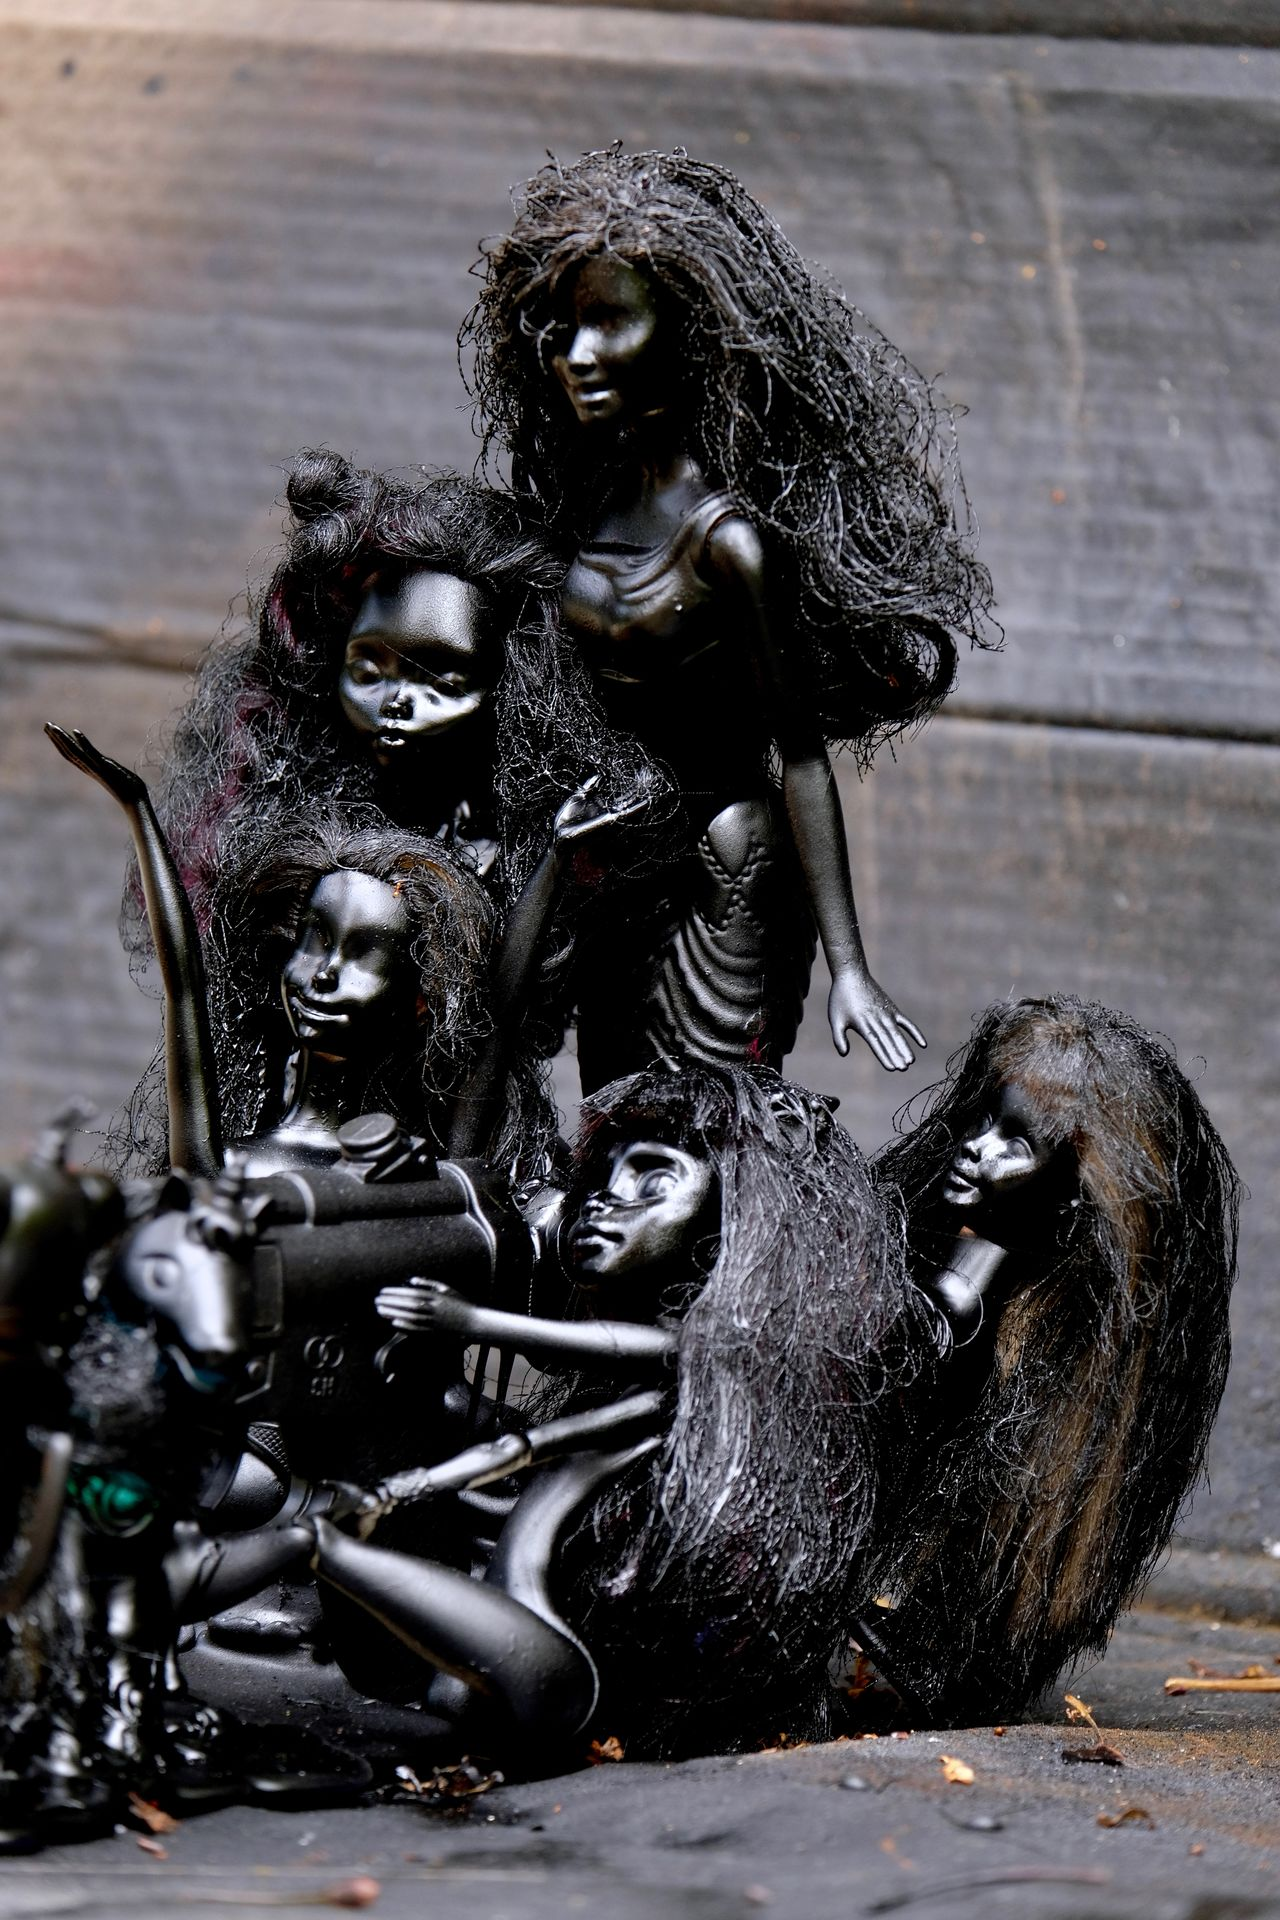 High Five! Big Gun Black Barbies BYOPaper! Close-up Creativity Famous Five Female Likeness Girls Human Representation Petrol Sculpture